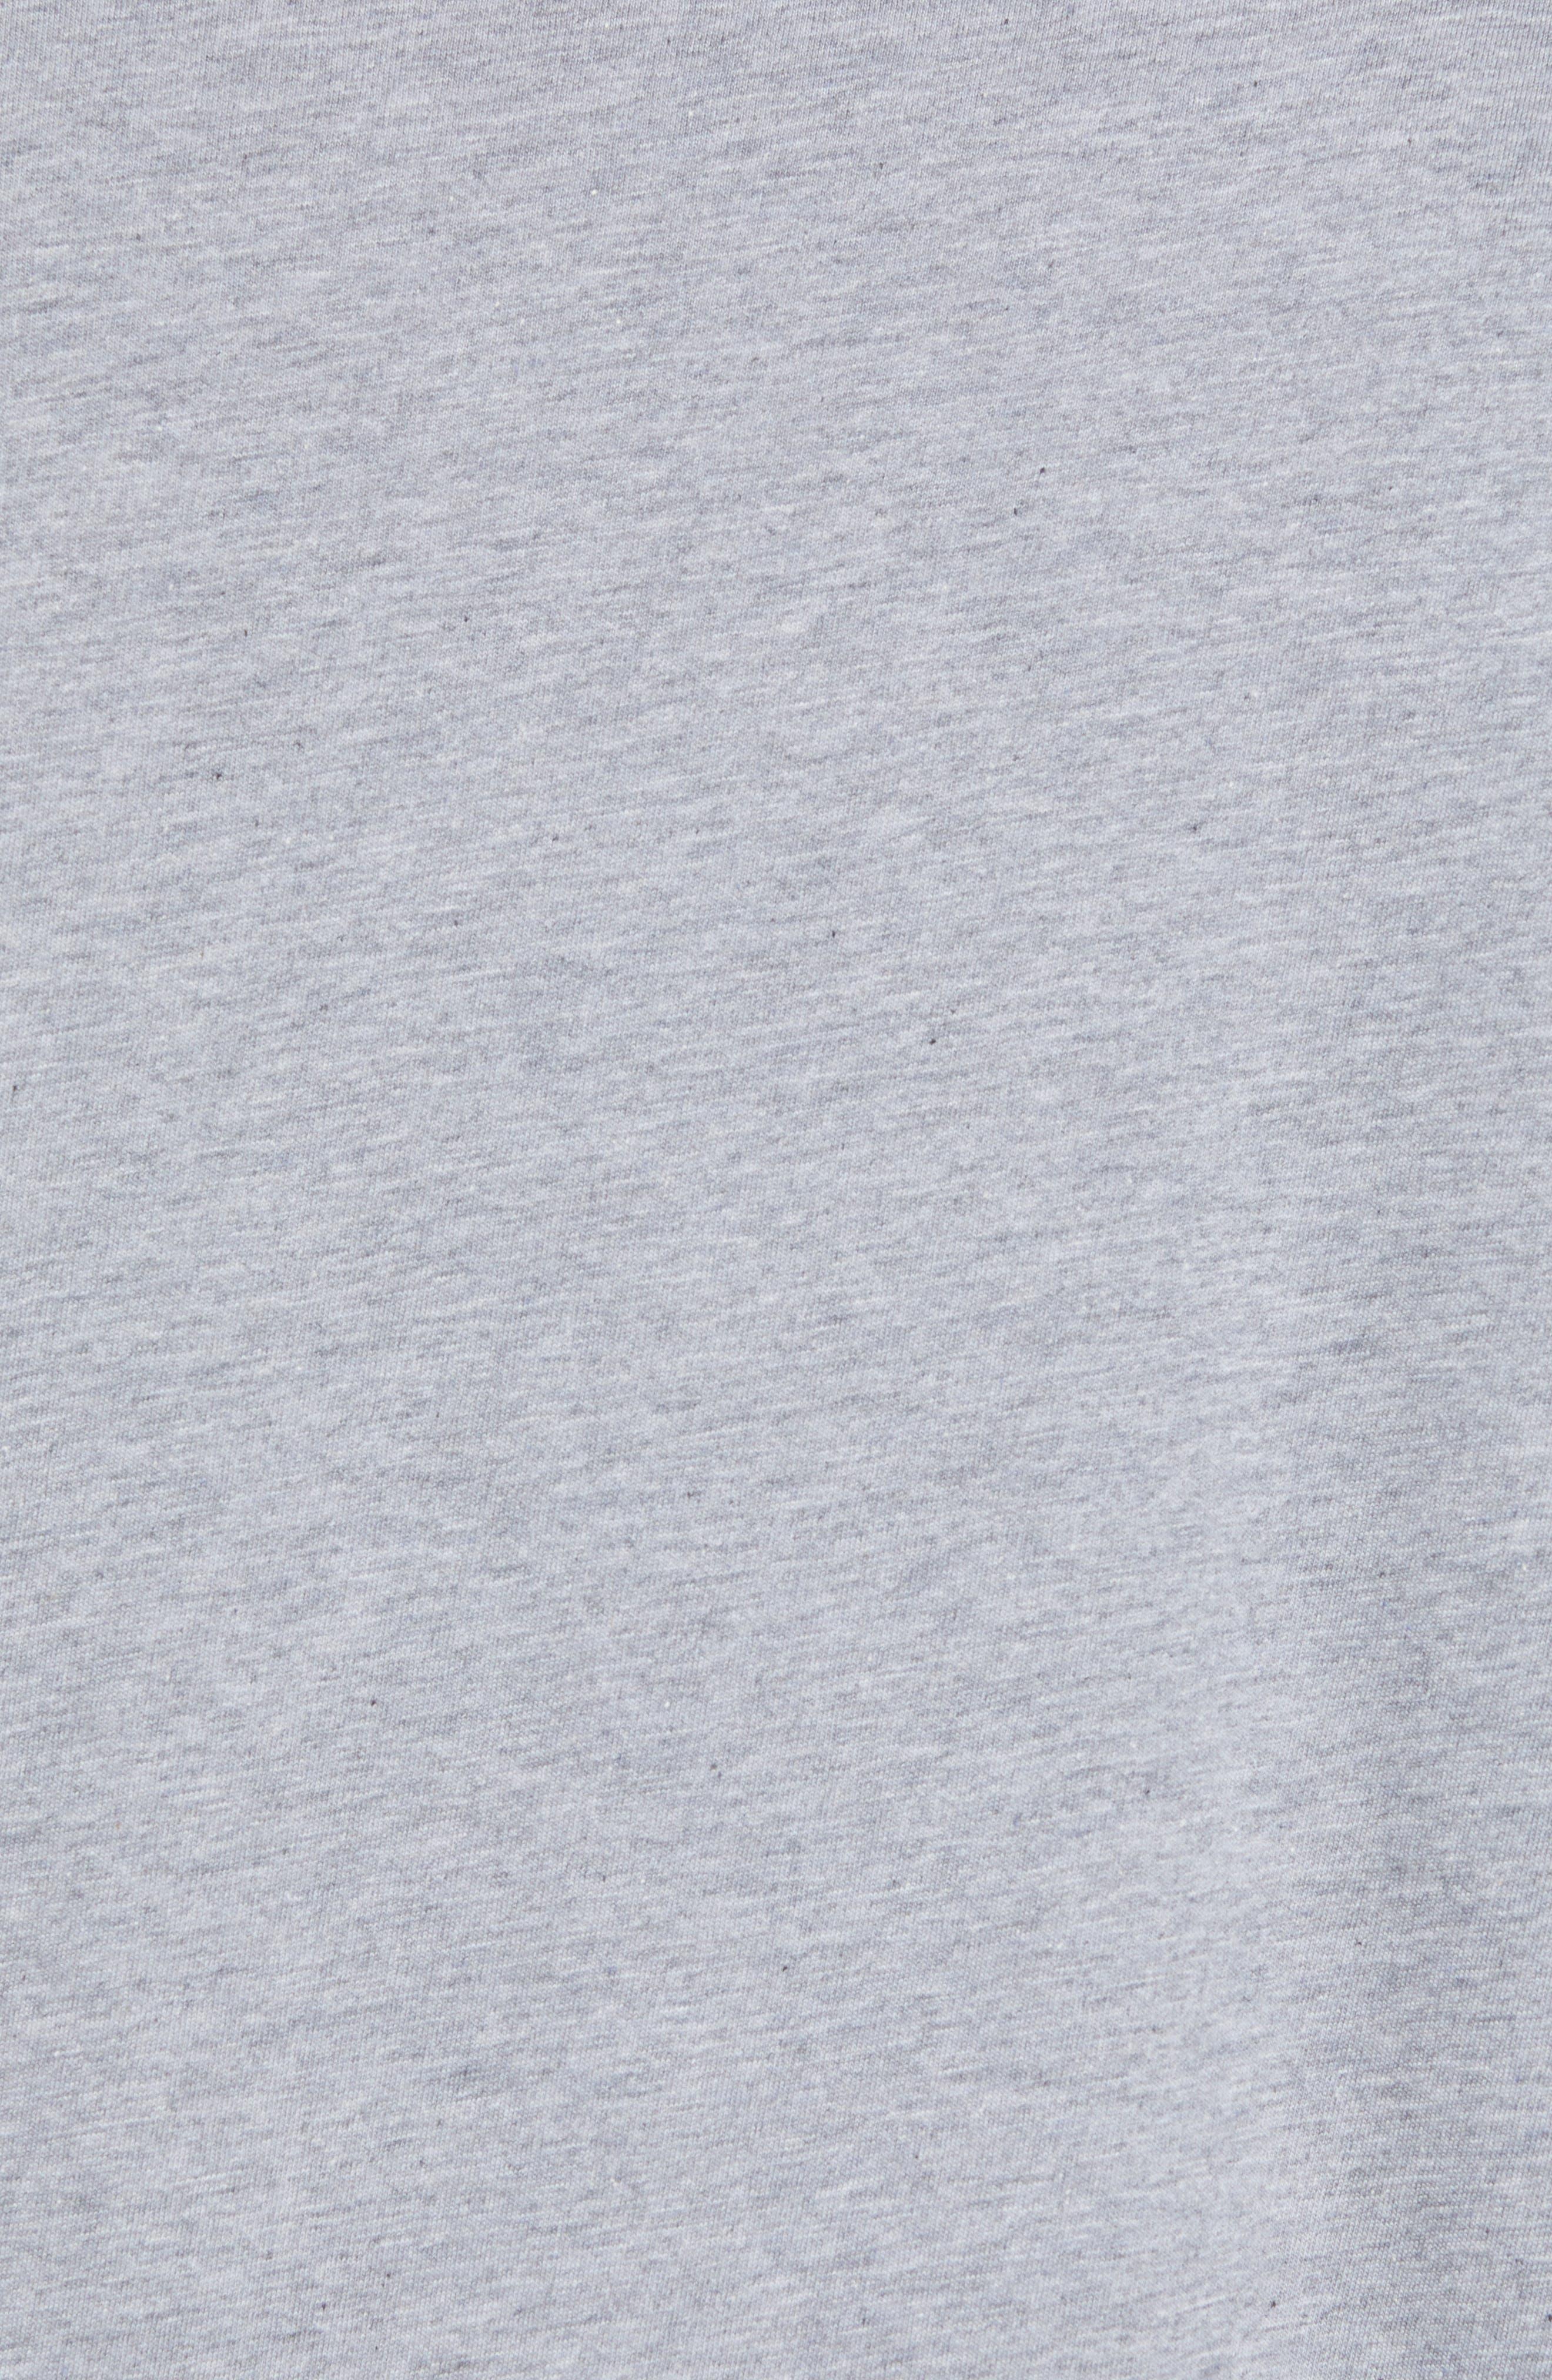 Shibby Crewneck T-Shirt,                             Alternate thumbnail 5, color,                             HEATHER GREY